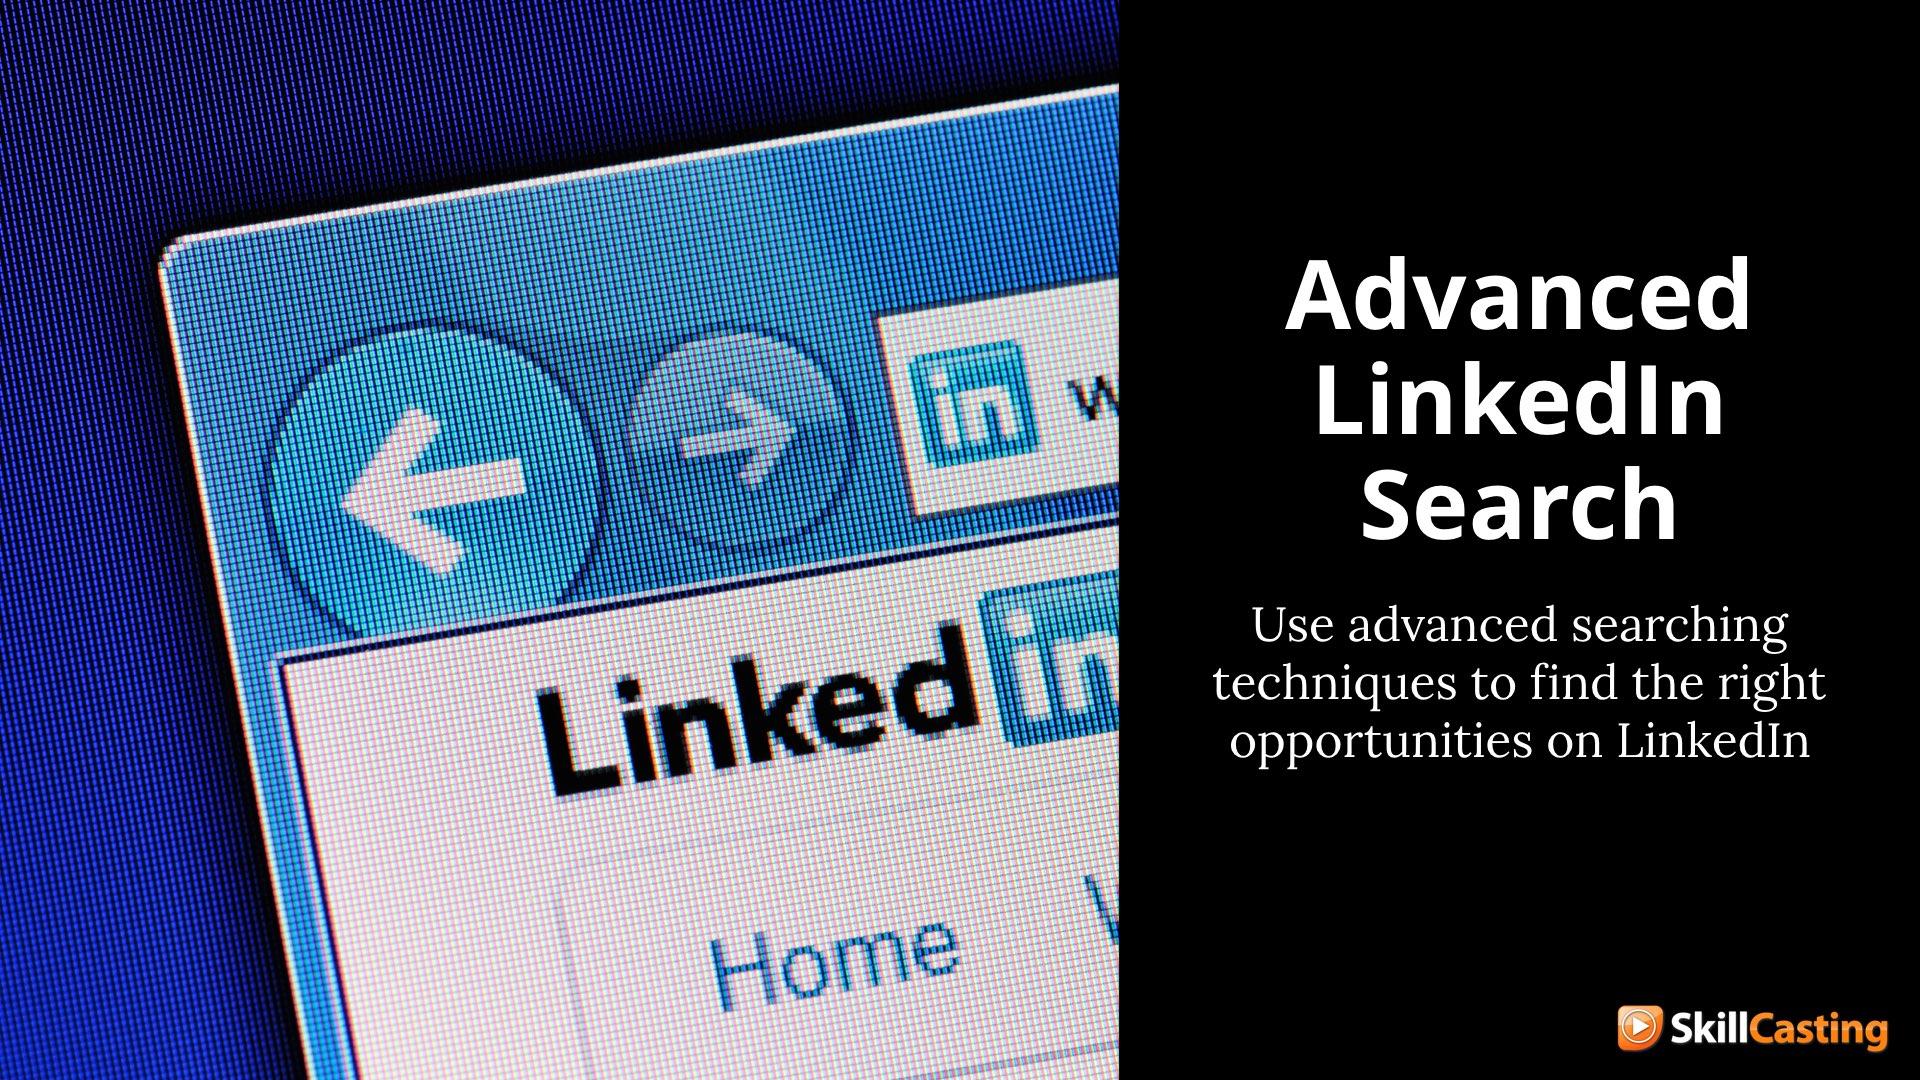 Advanced LinkedIn Search